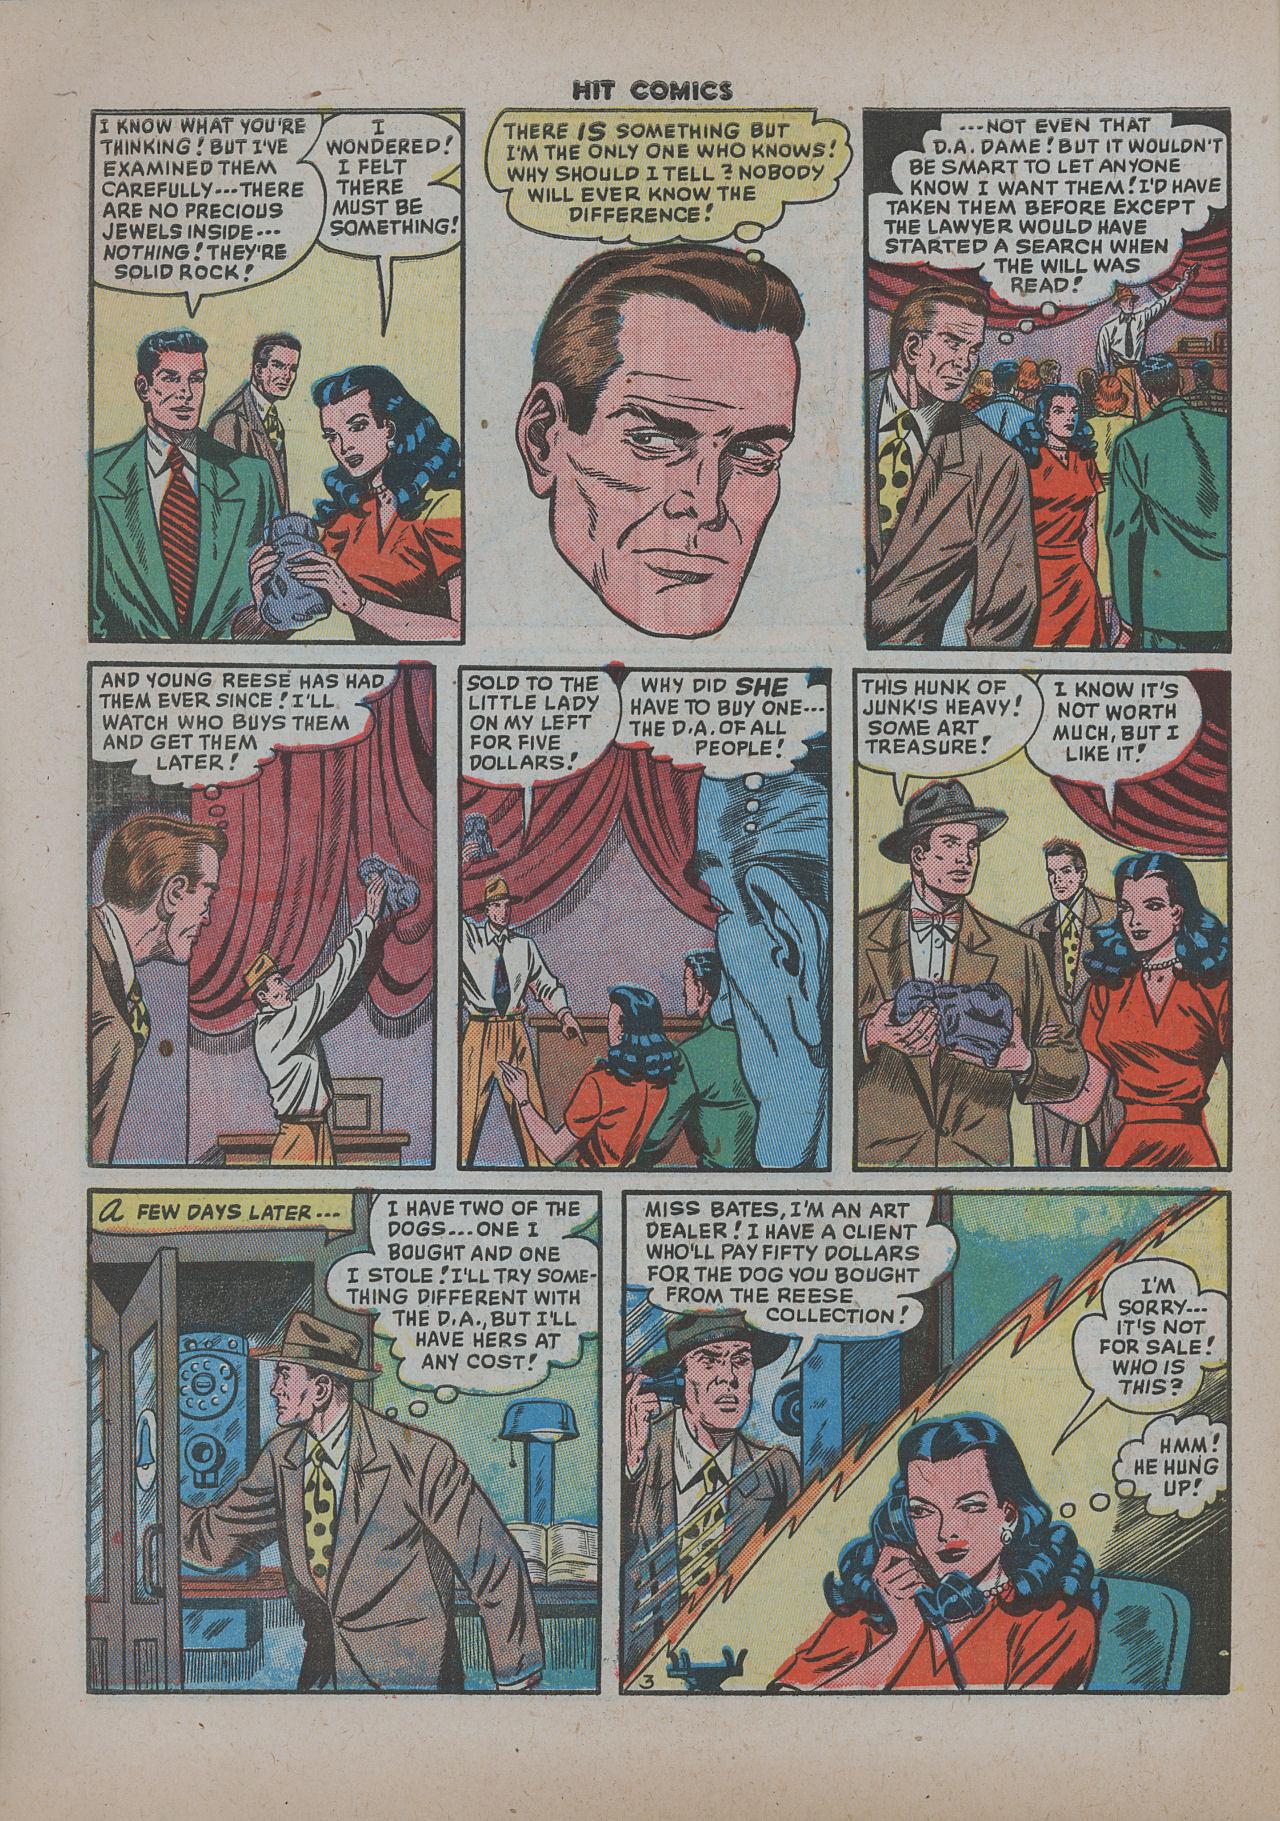 Read online Hit Comics comic -  Issue #62 - 31